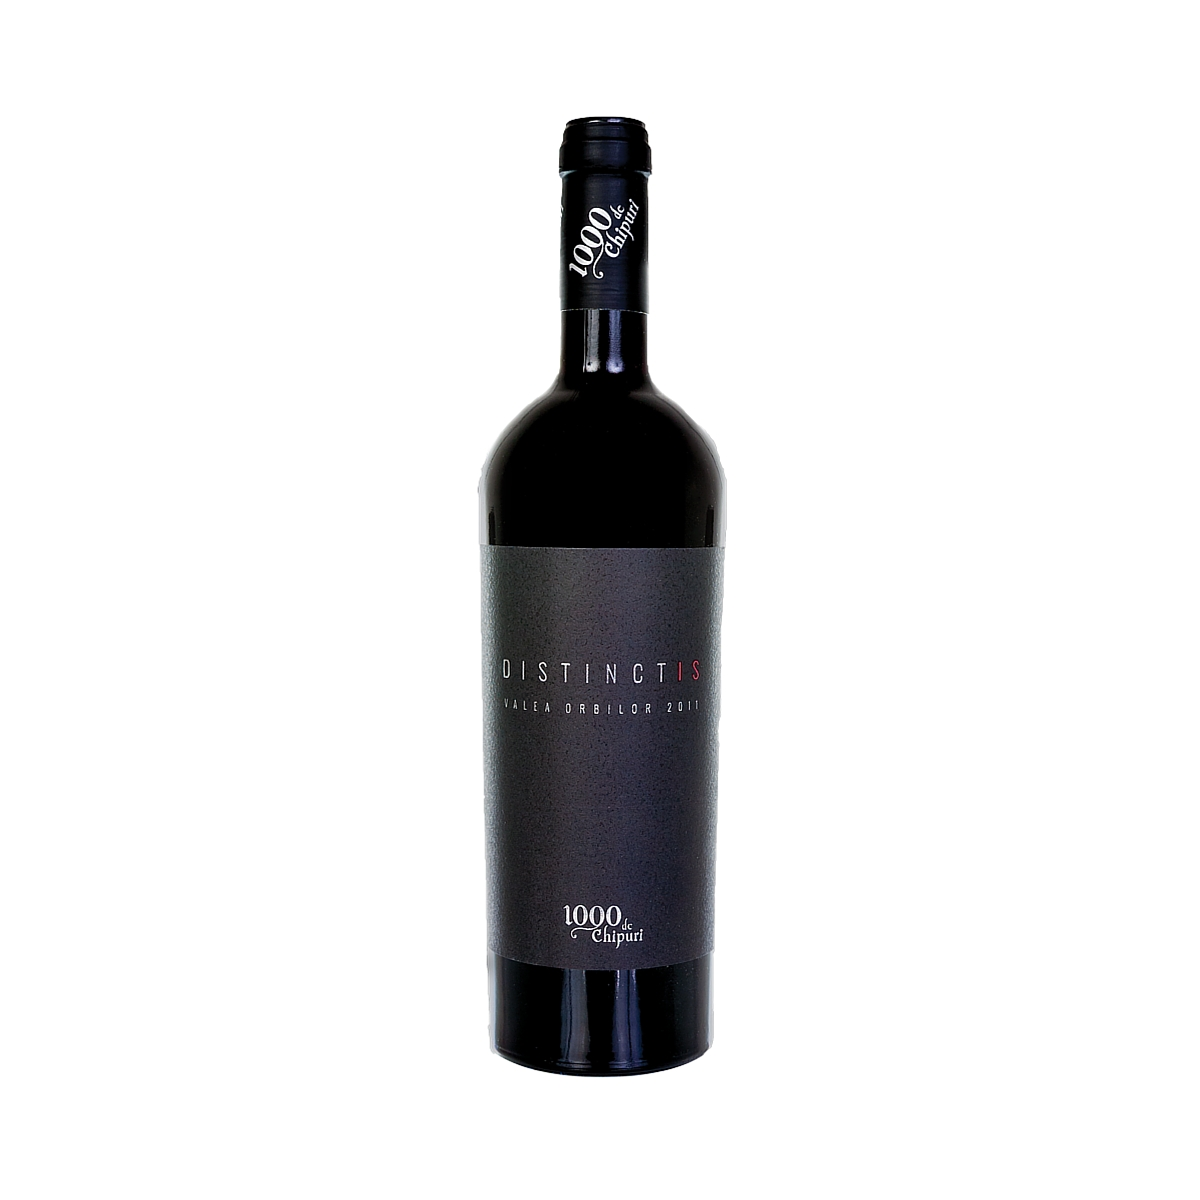 Vin rosu - 1000 de chipuri Distinctis, 2011, sec 1000 de chipuri